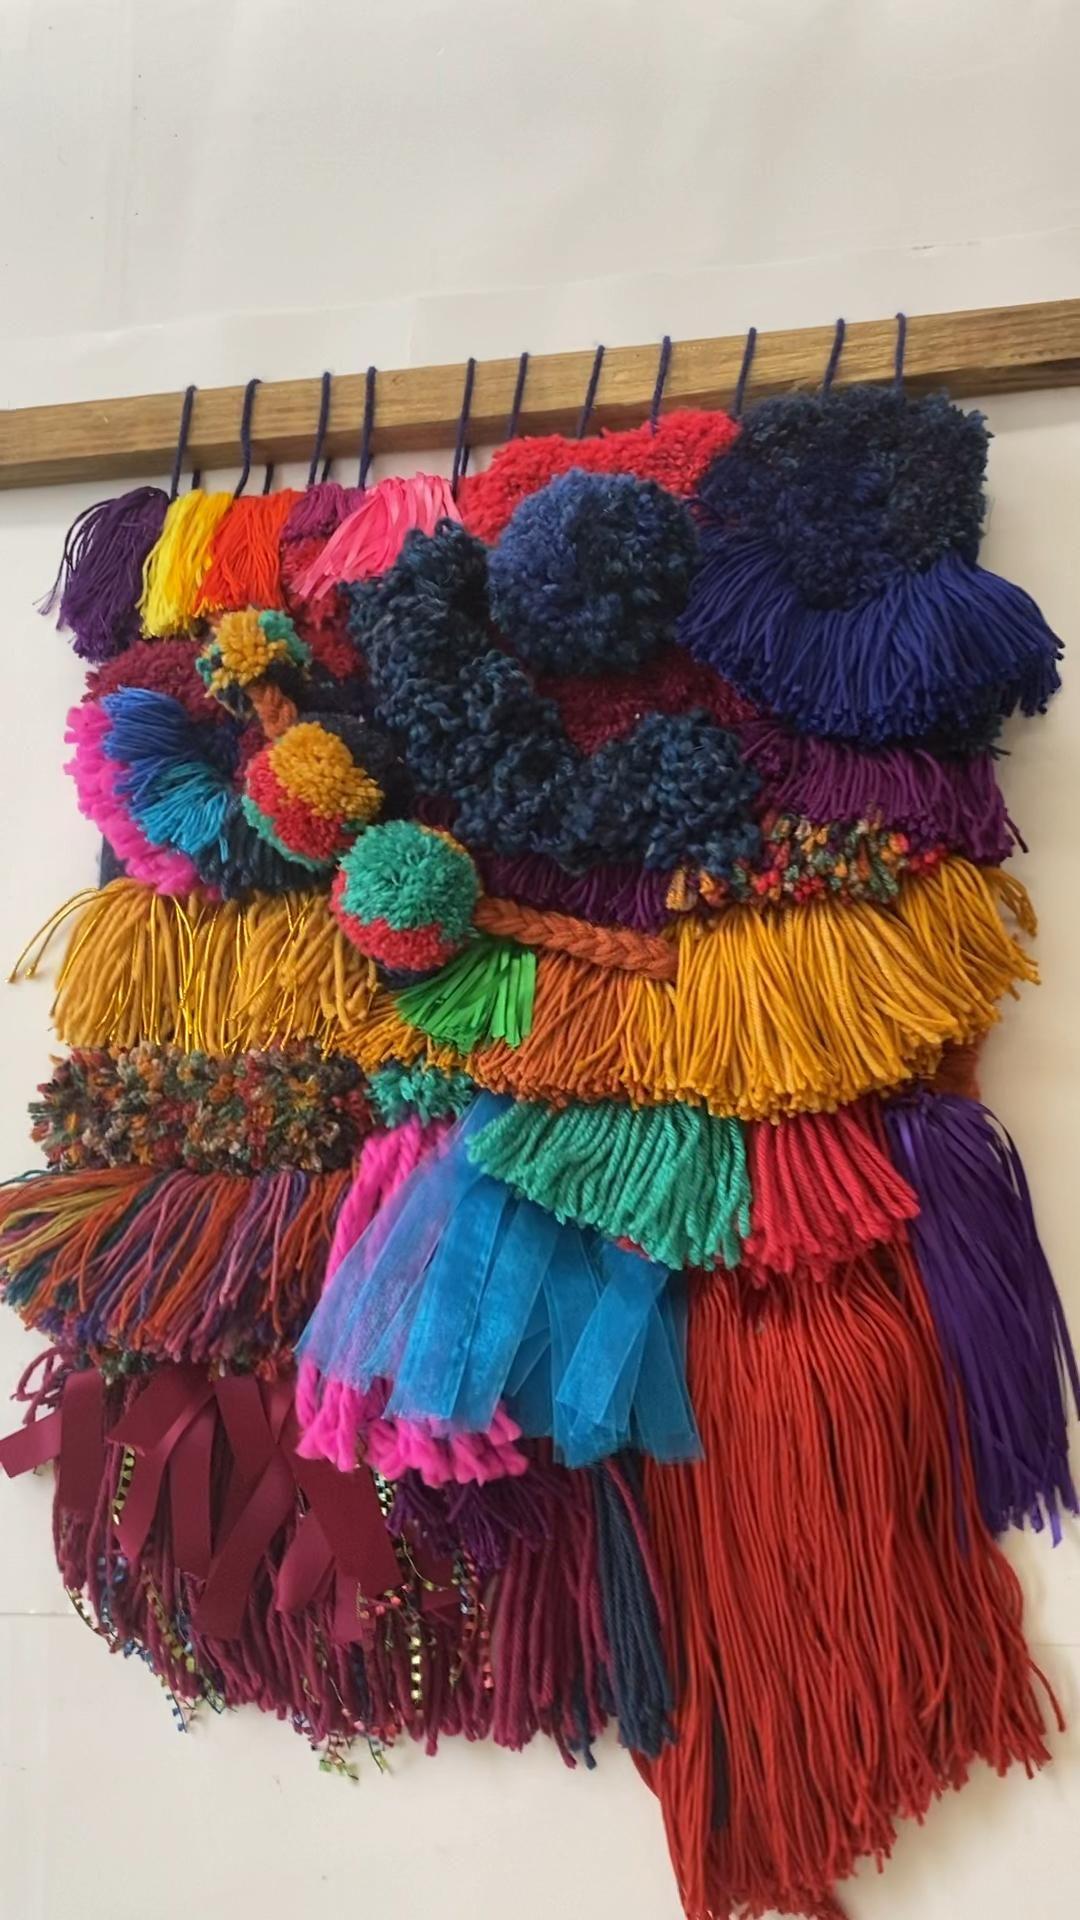 #weaving #walldecor #wallhanging #homedecor #sustainablehome #atlanta #handmade #colorblock #brightandbold #groovy #upcycle #yarn #macrame #weaversofinstagram #colouryourhome #wovenwallhanging #woven #acolorstory #yarn #textileartist #texture #wovenwednesday #wallartdecor #jeweltones #boho #fiesta #boldcolors